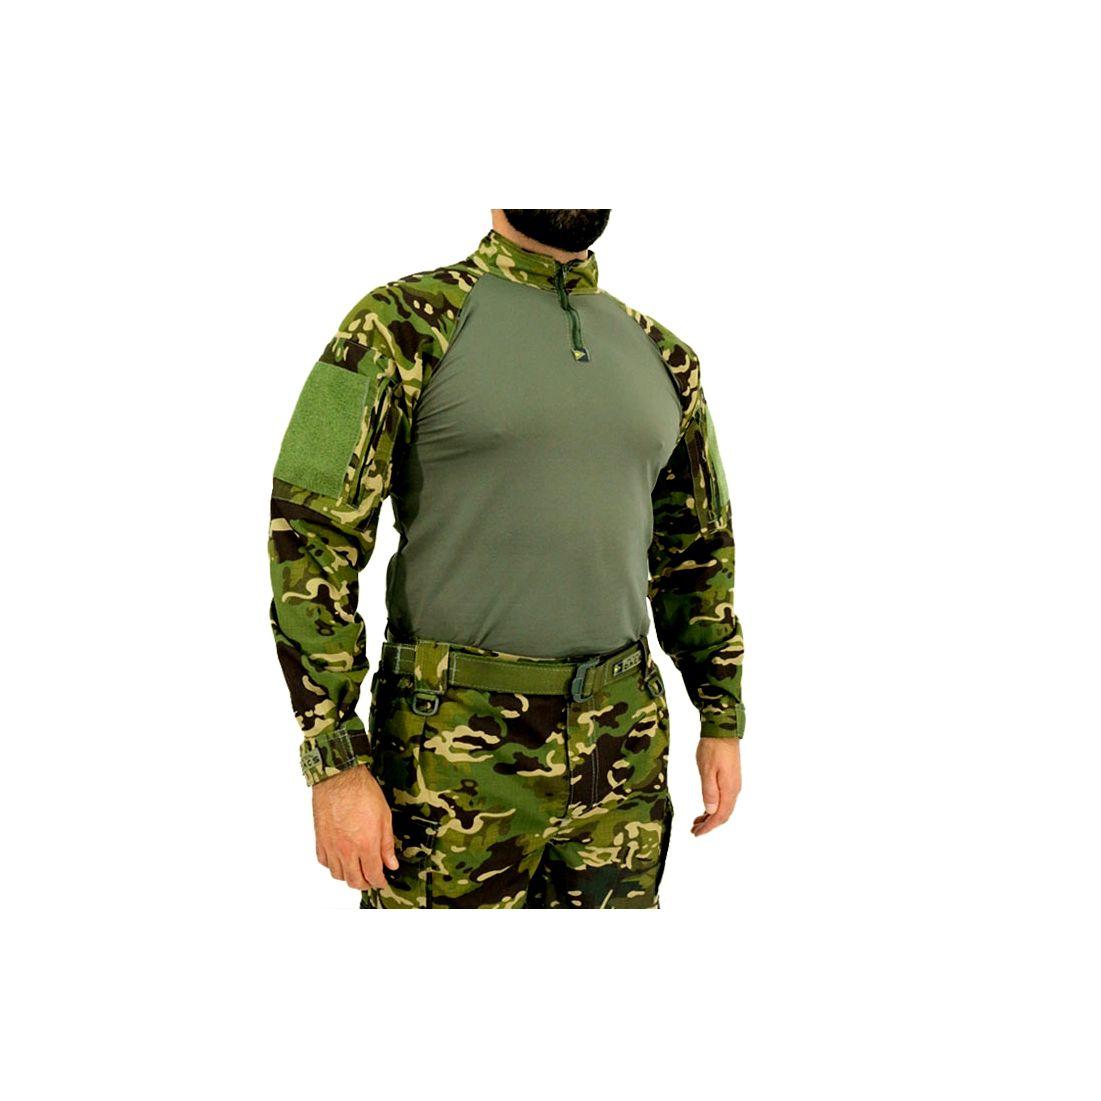 Farda Uniforme Militar Hrt Multicam Tropical Dacs Original